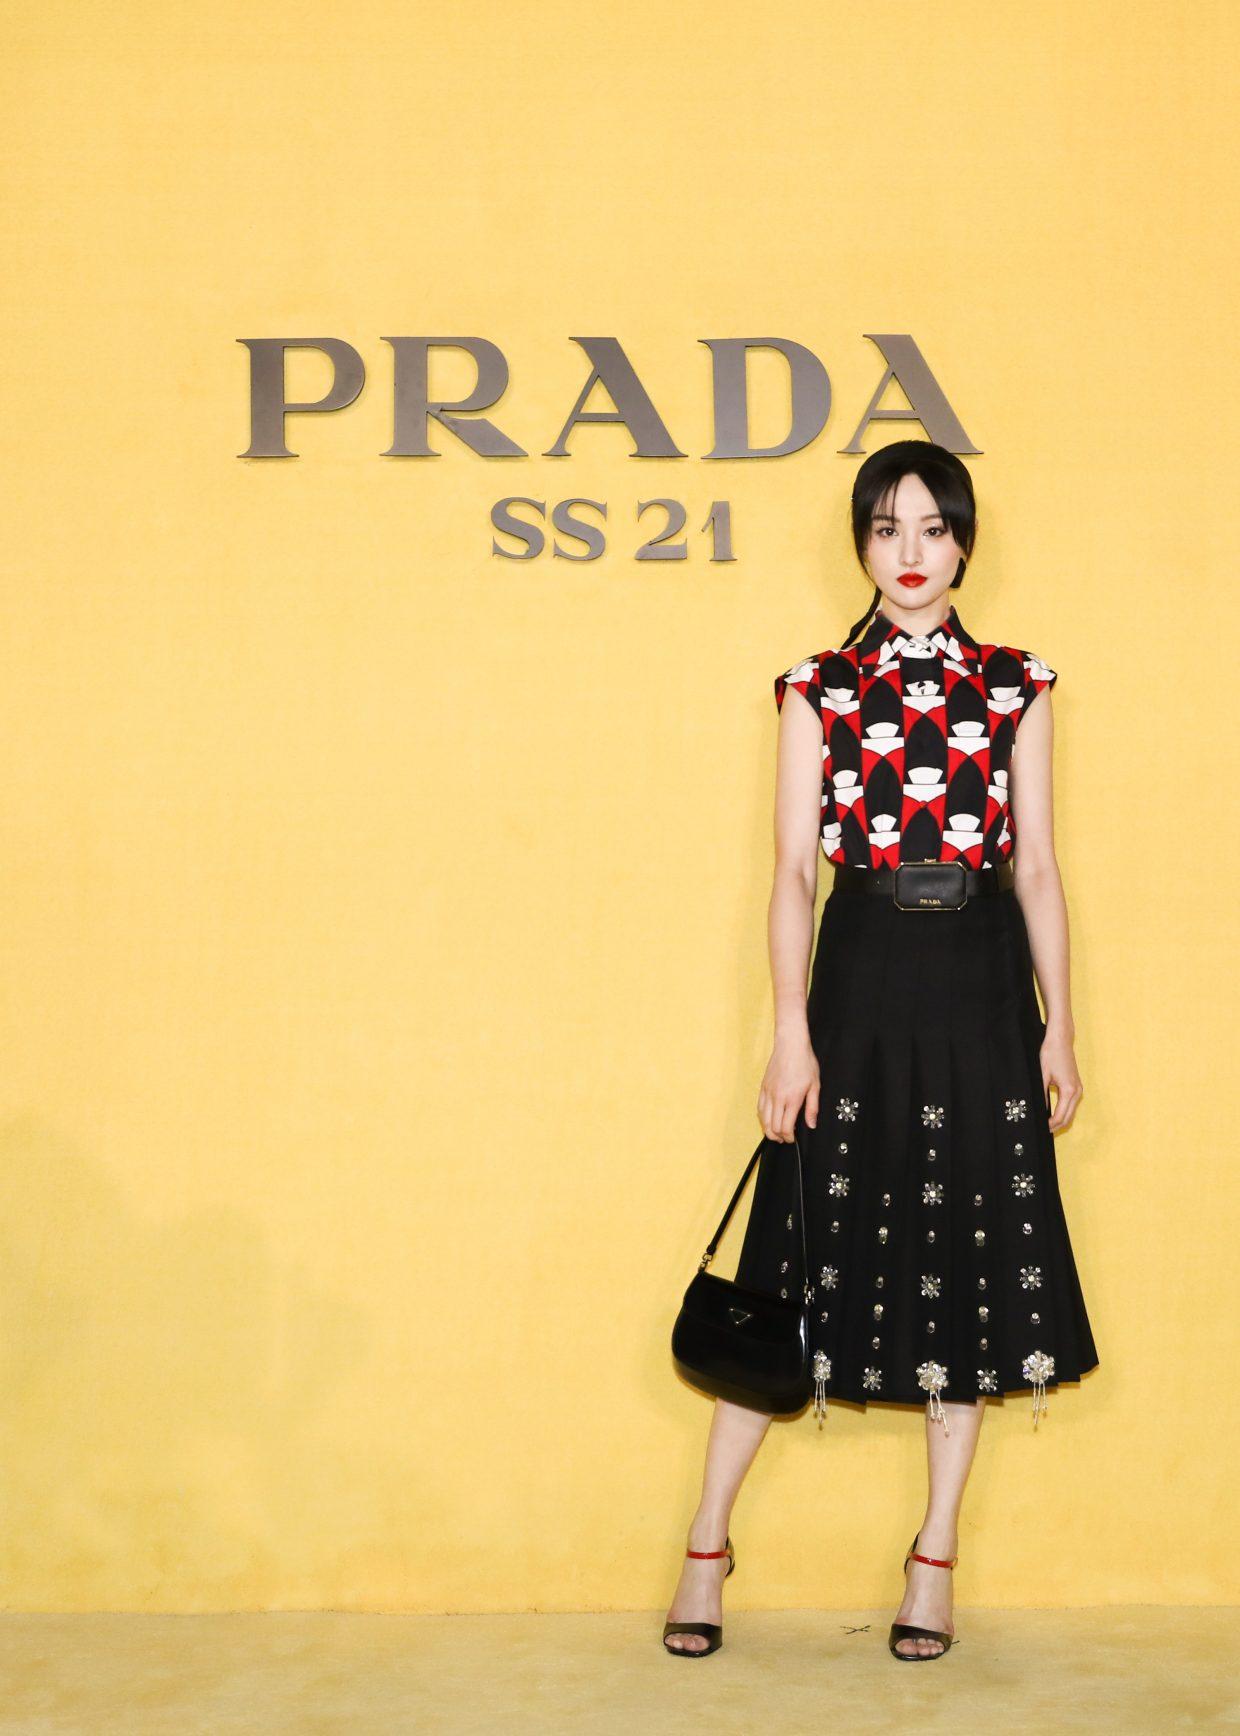 Prada оказались в центре скандала из-за нового амбассадора